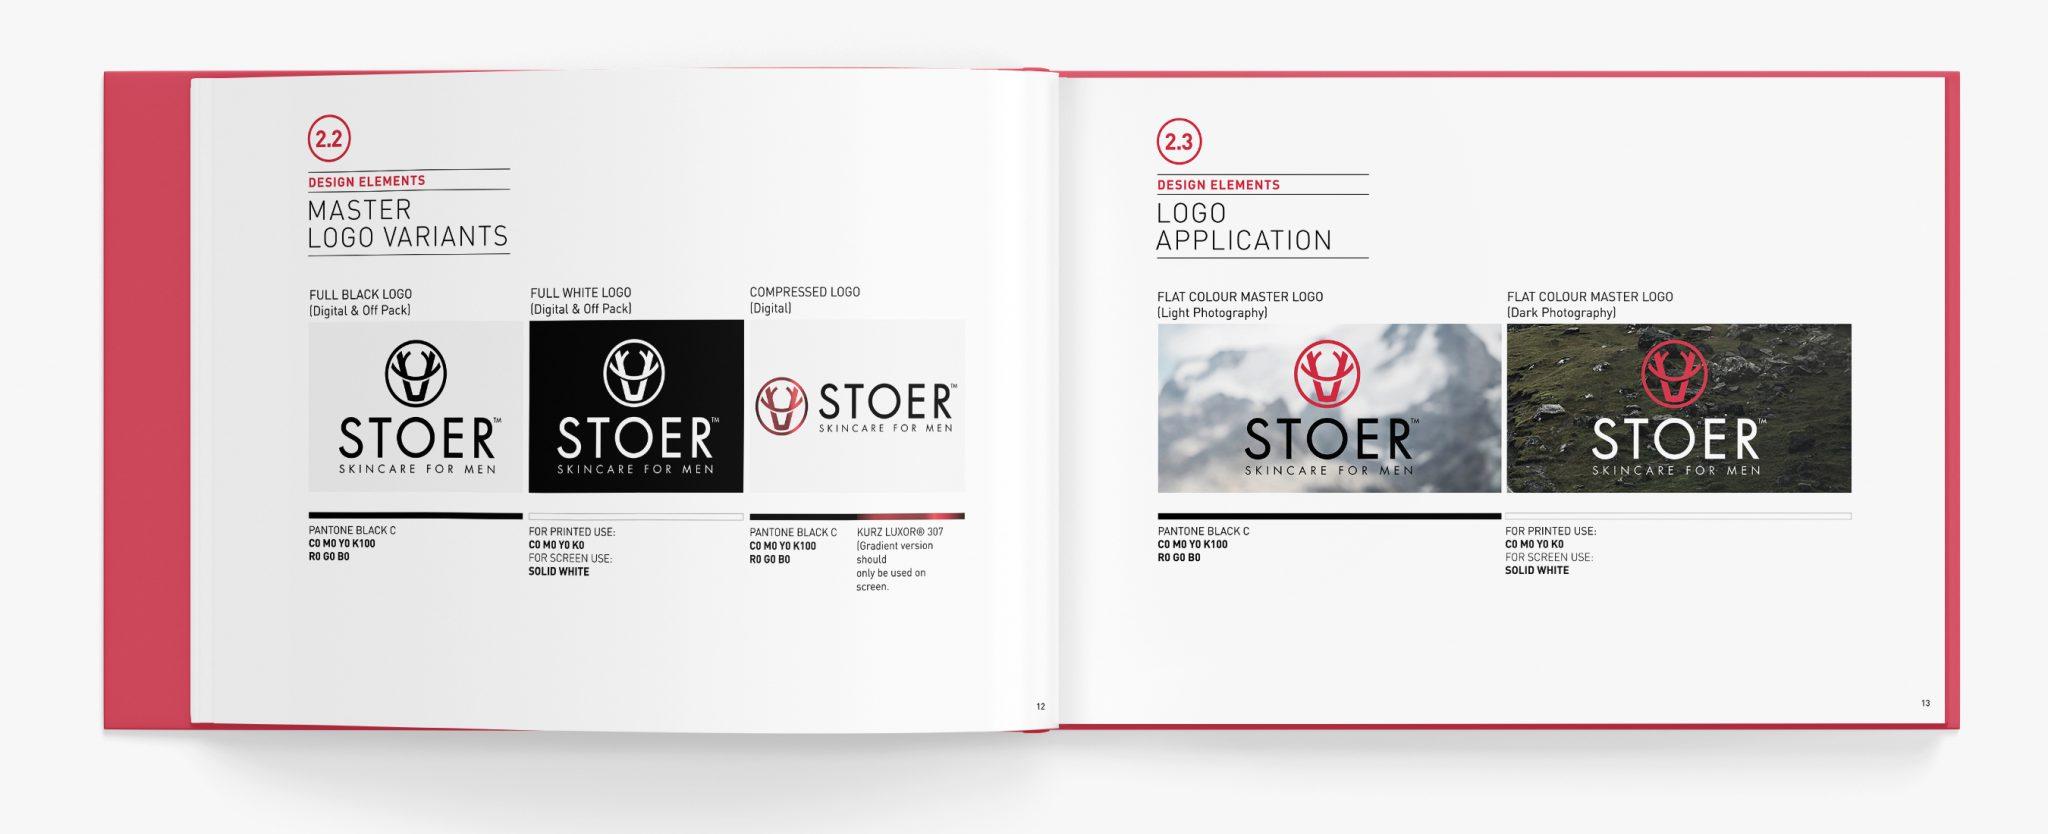 Stoer brand book